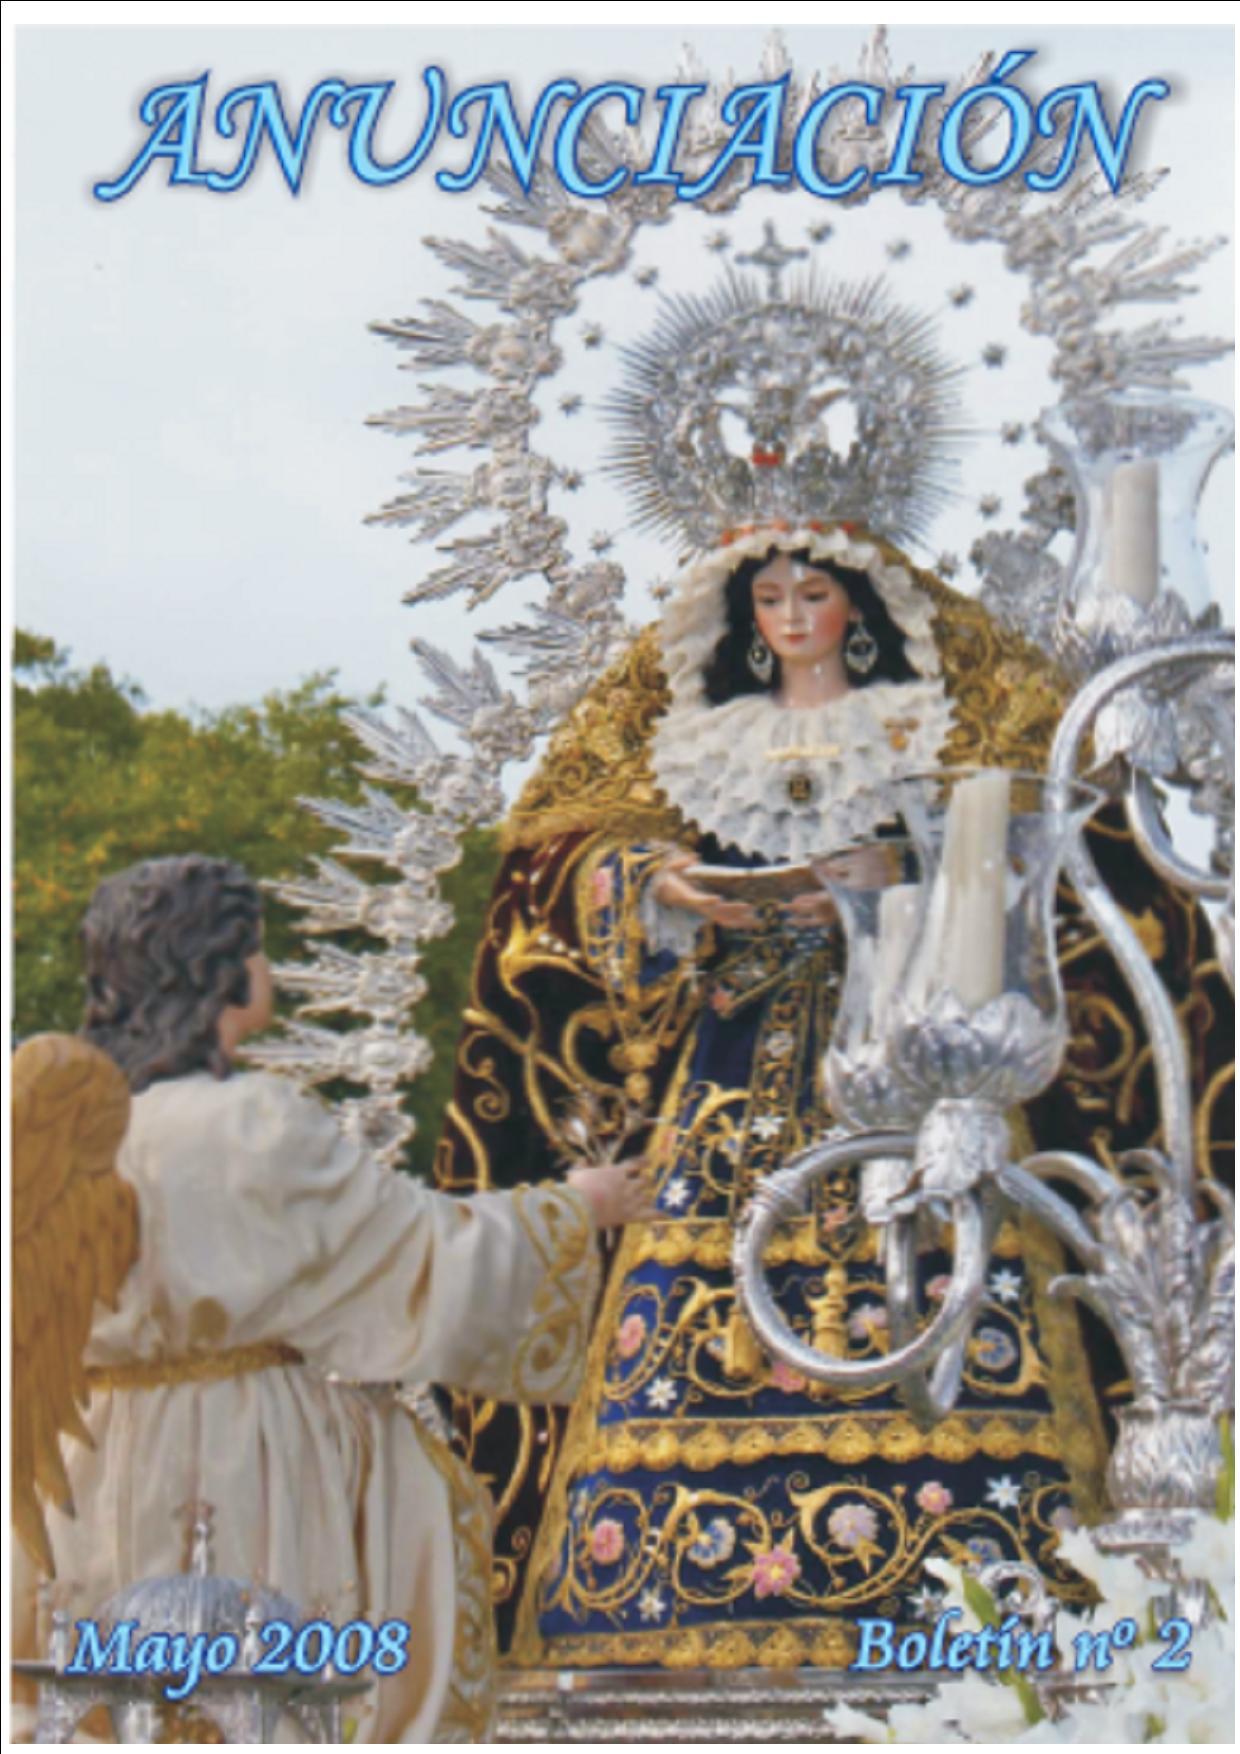 Boletin nº 2 - 2008